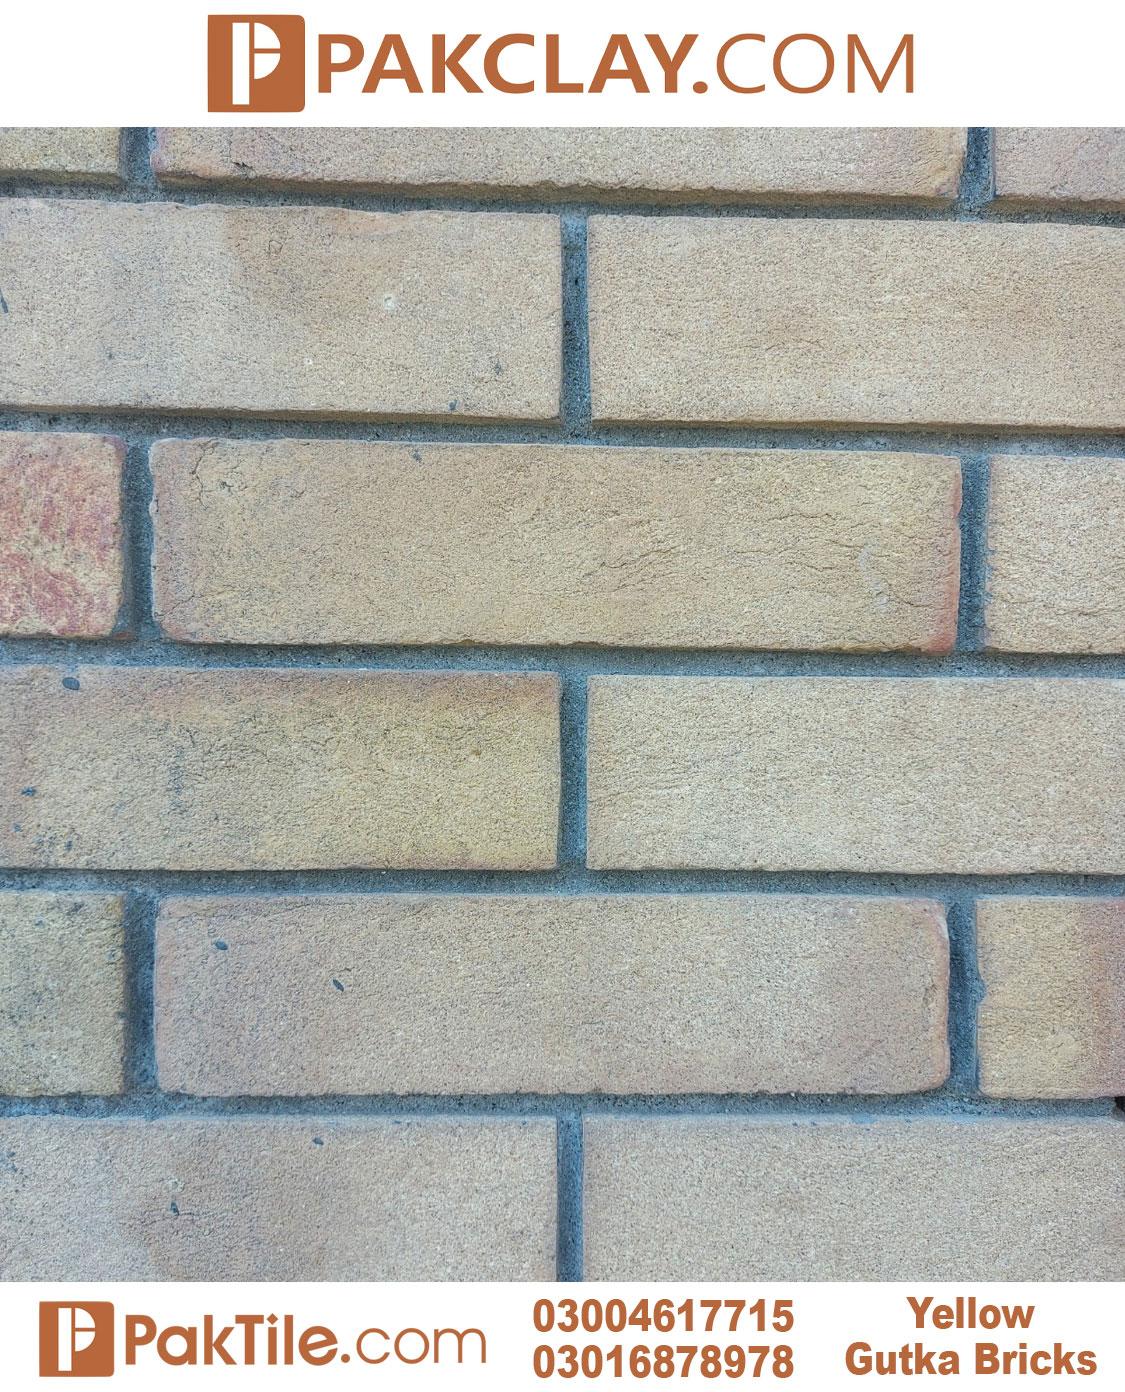 Yellow Gutka Brick Price in Pakistan